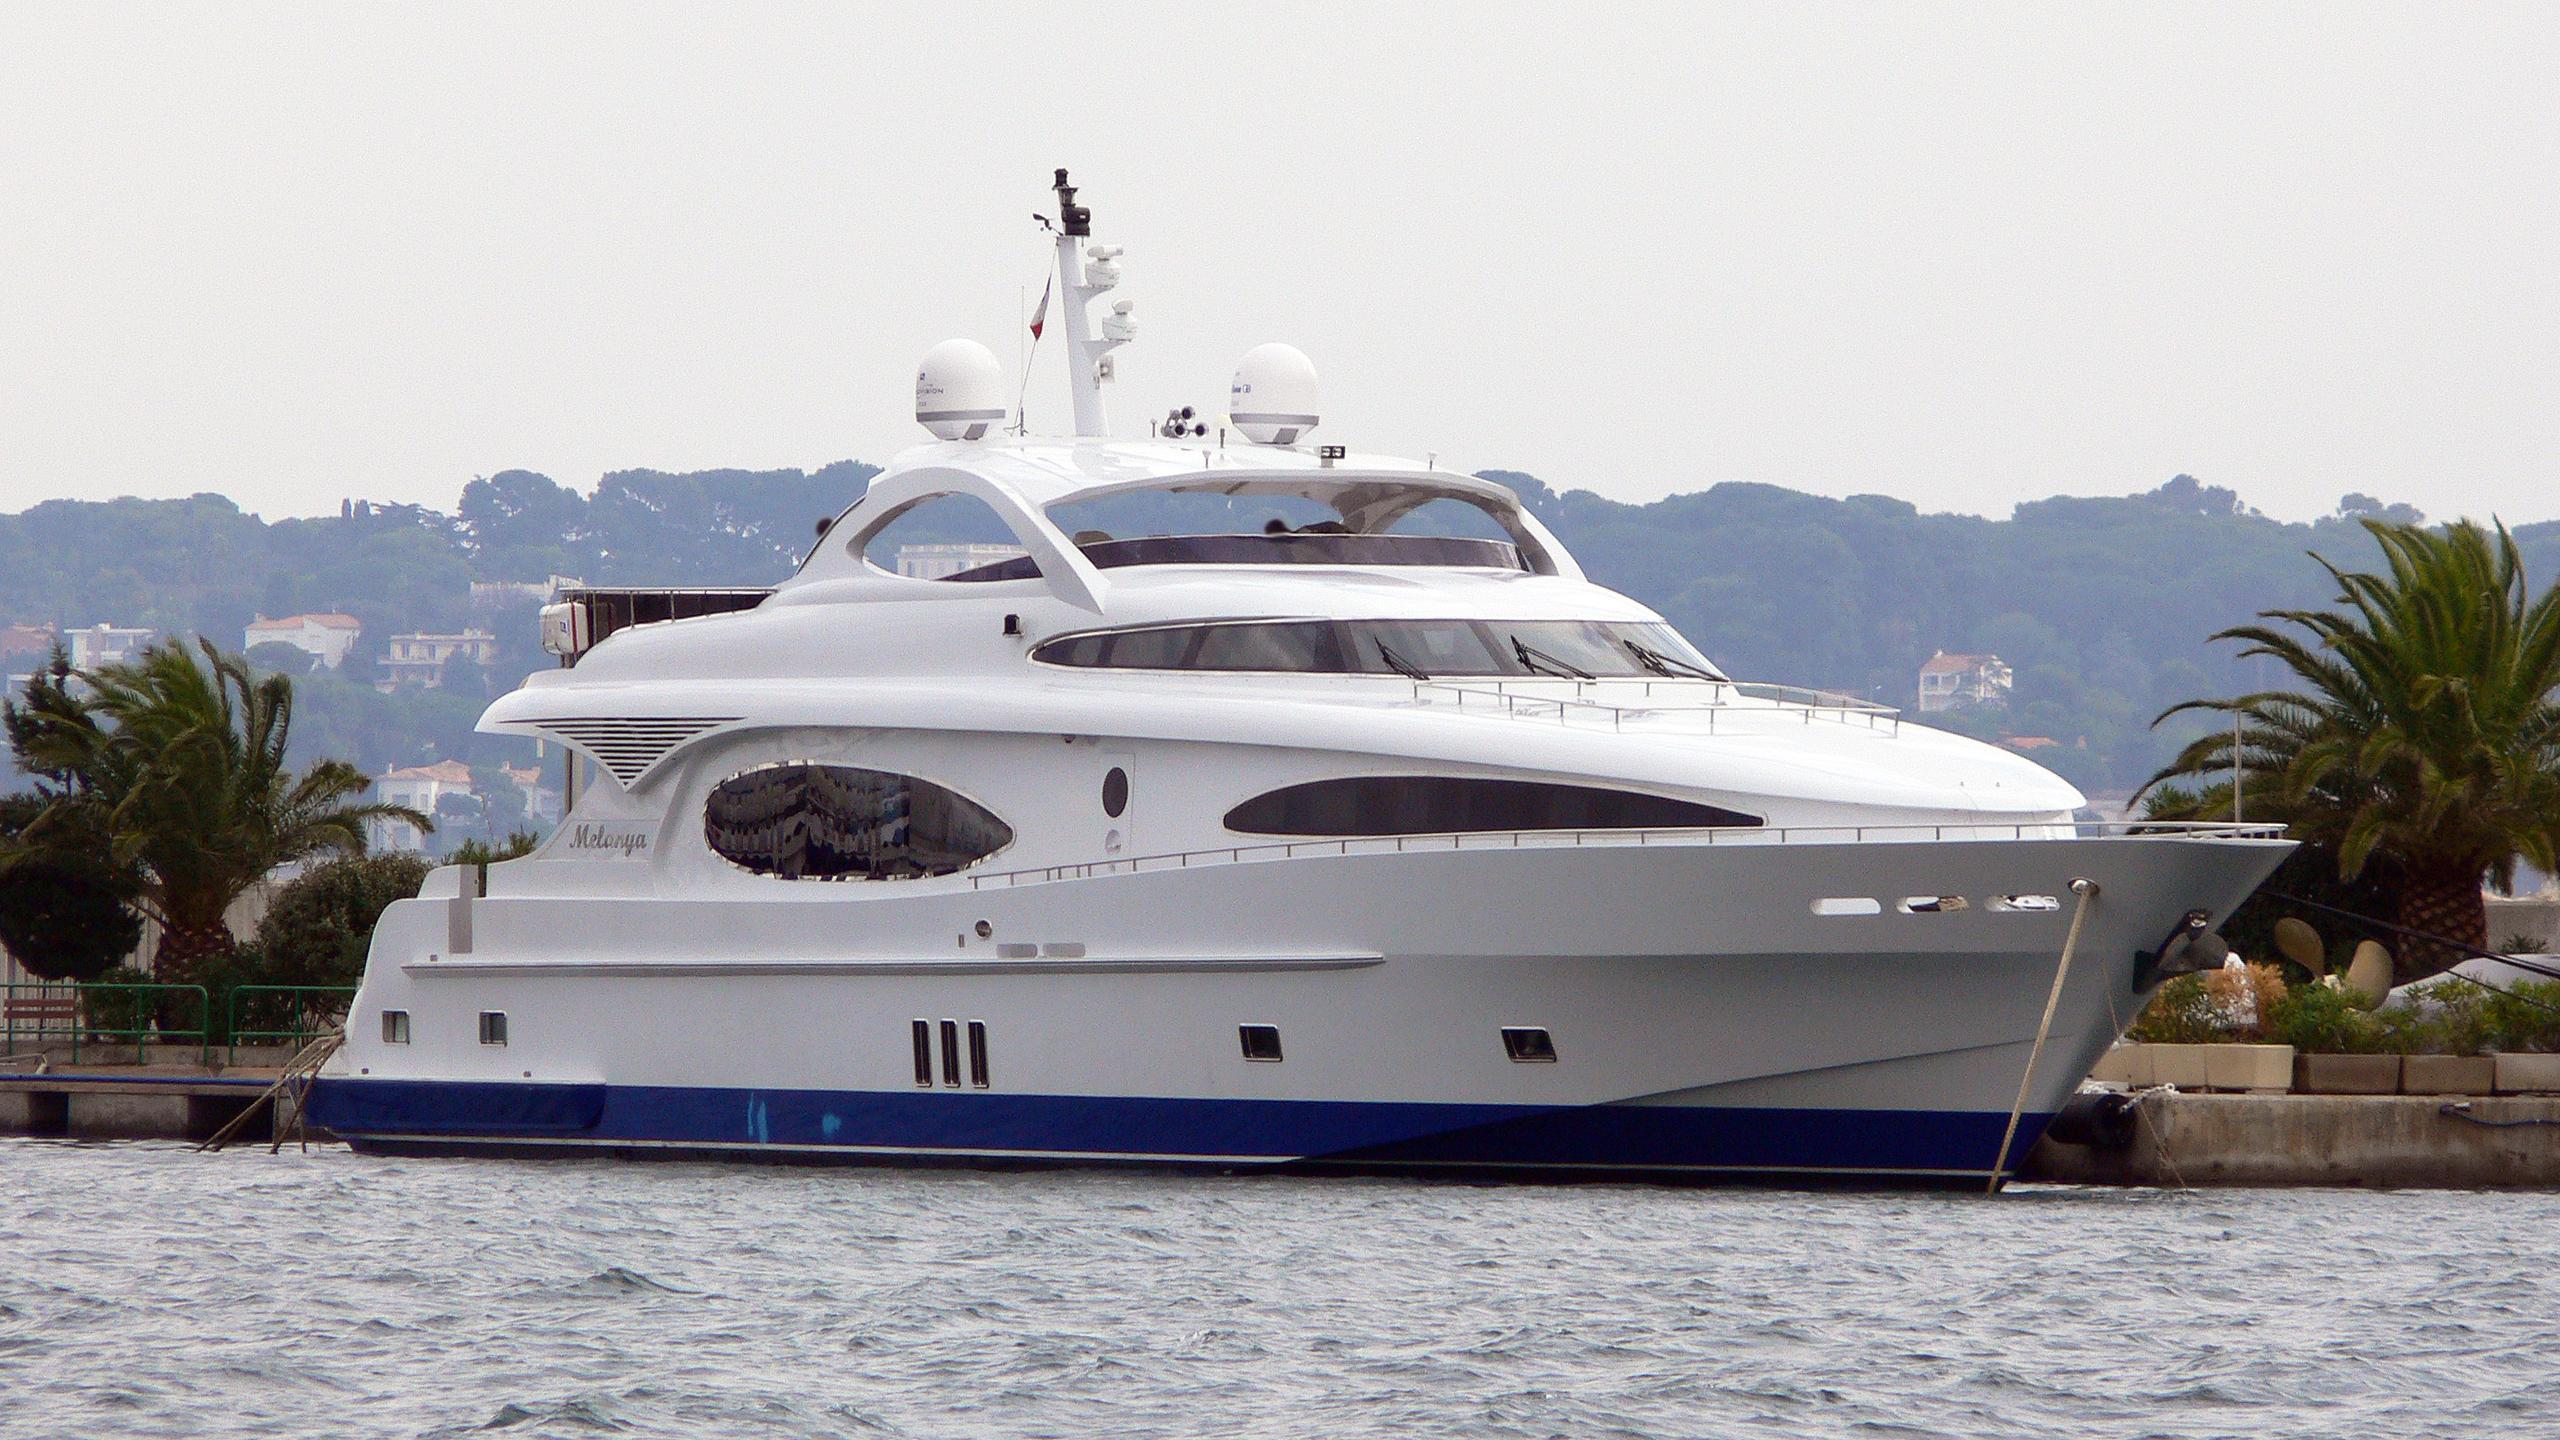 melanya-motor-yacht-gulf-craft-majesty-118-2006-36m-half-profile